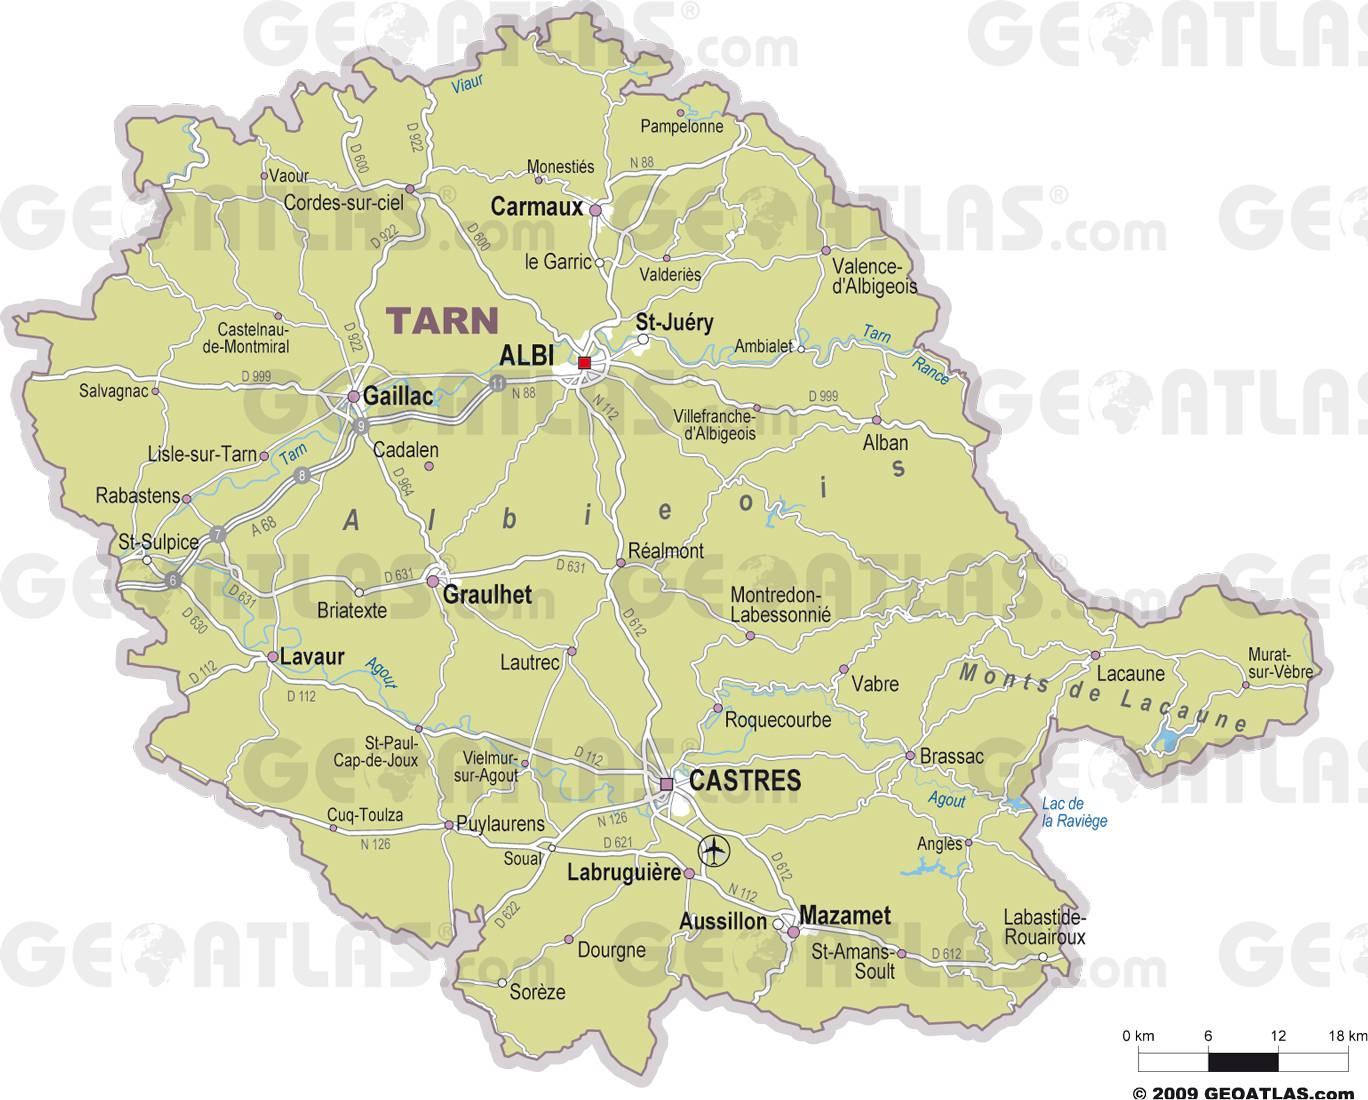 Carte des villes du Tarn